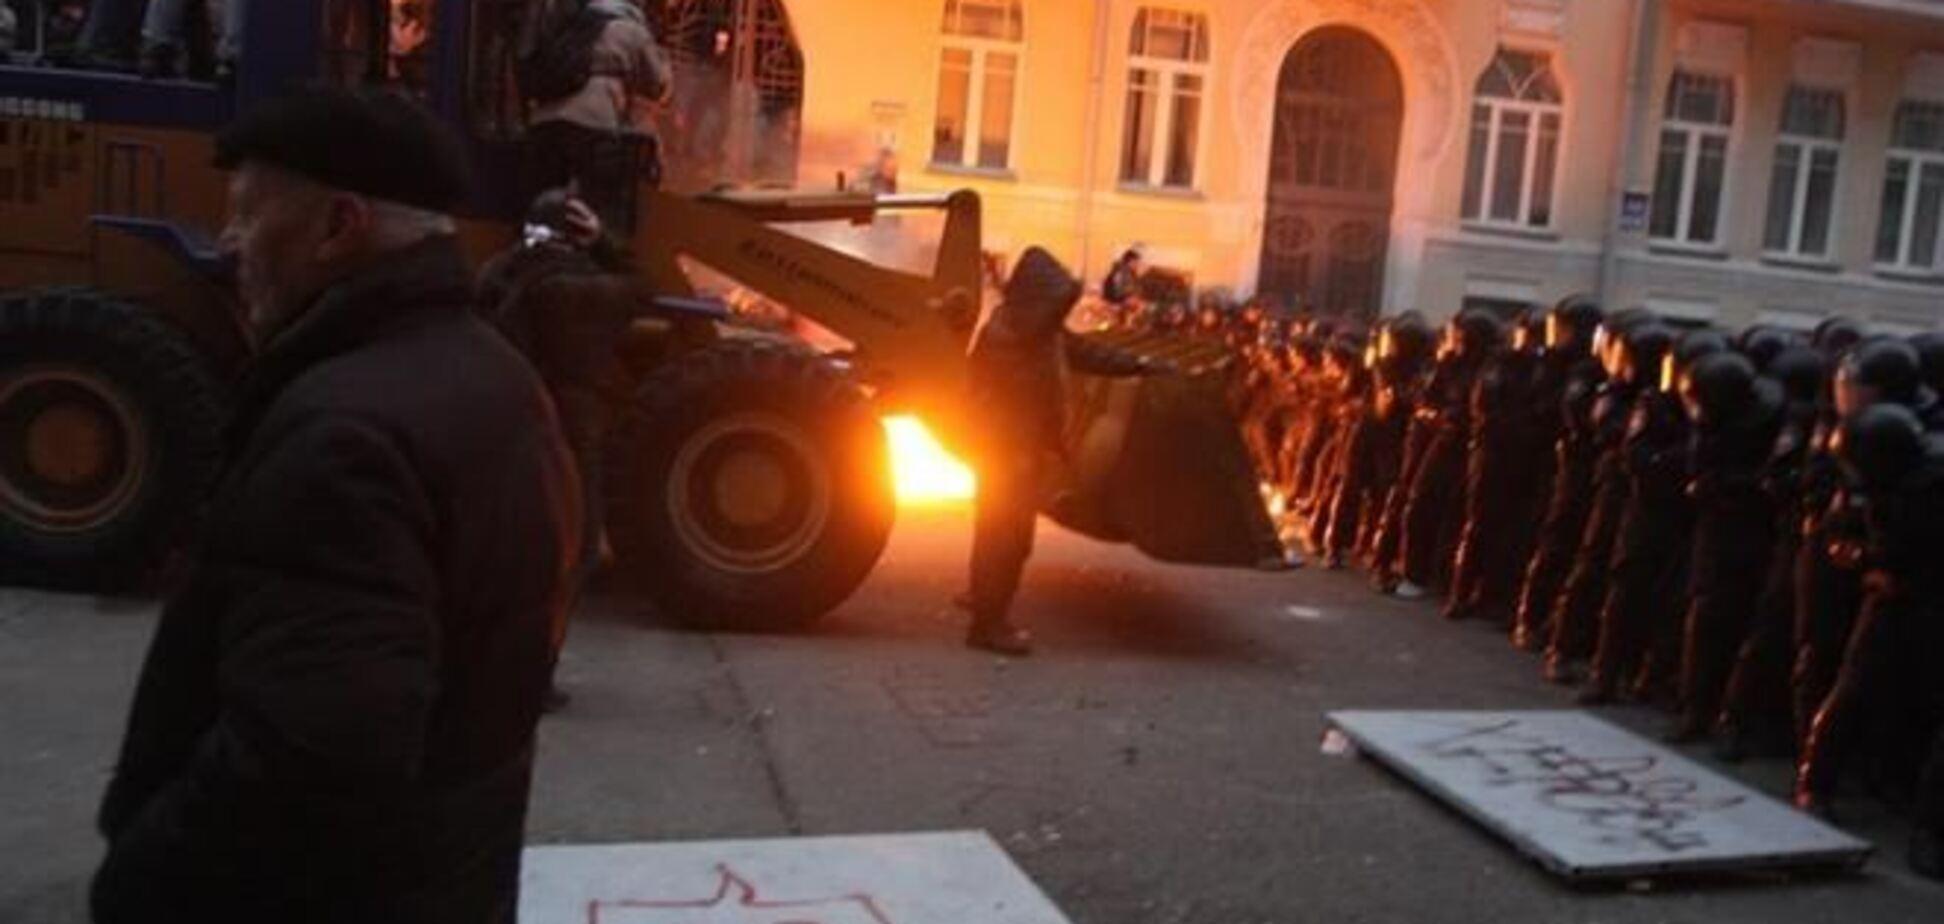 Командир 'Беркута' трактором на Банковой не управлял - МВД